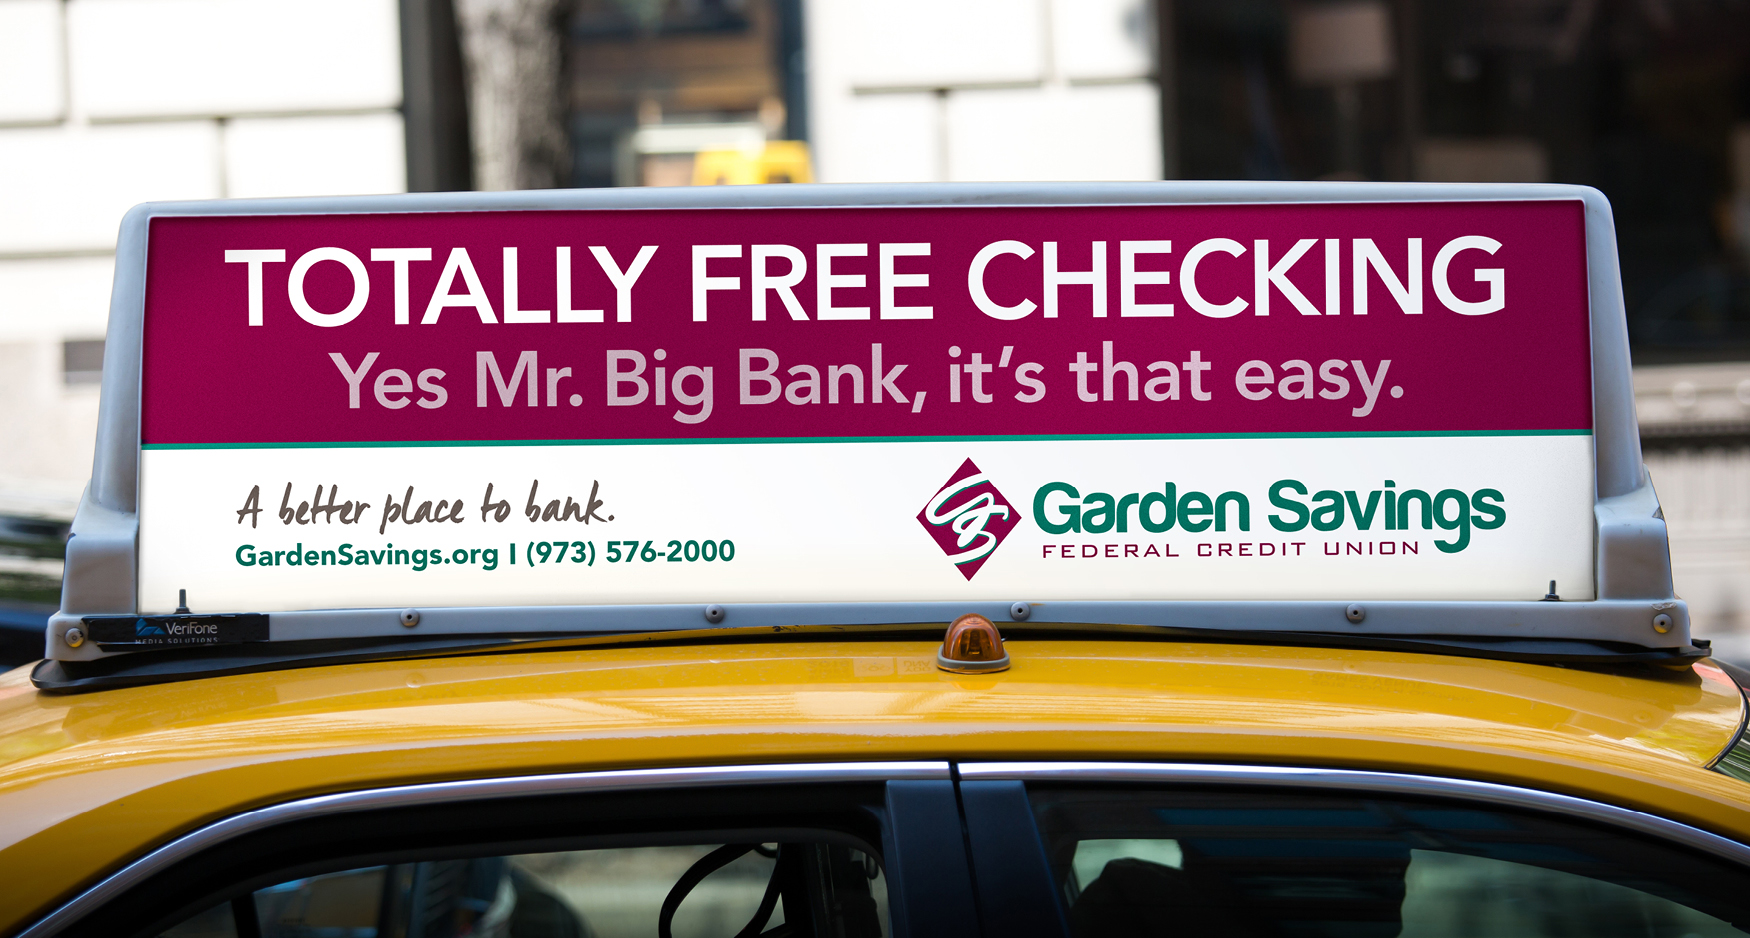 Taxi Topper - GARDEN SAVINGS – RETHINK YOUR BANK CAMPAIGN